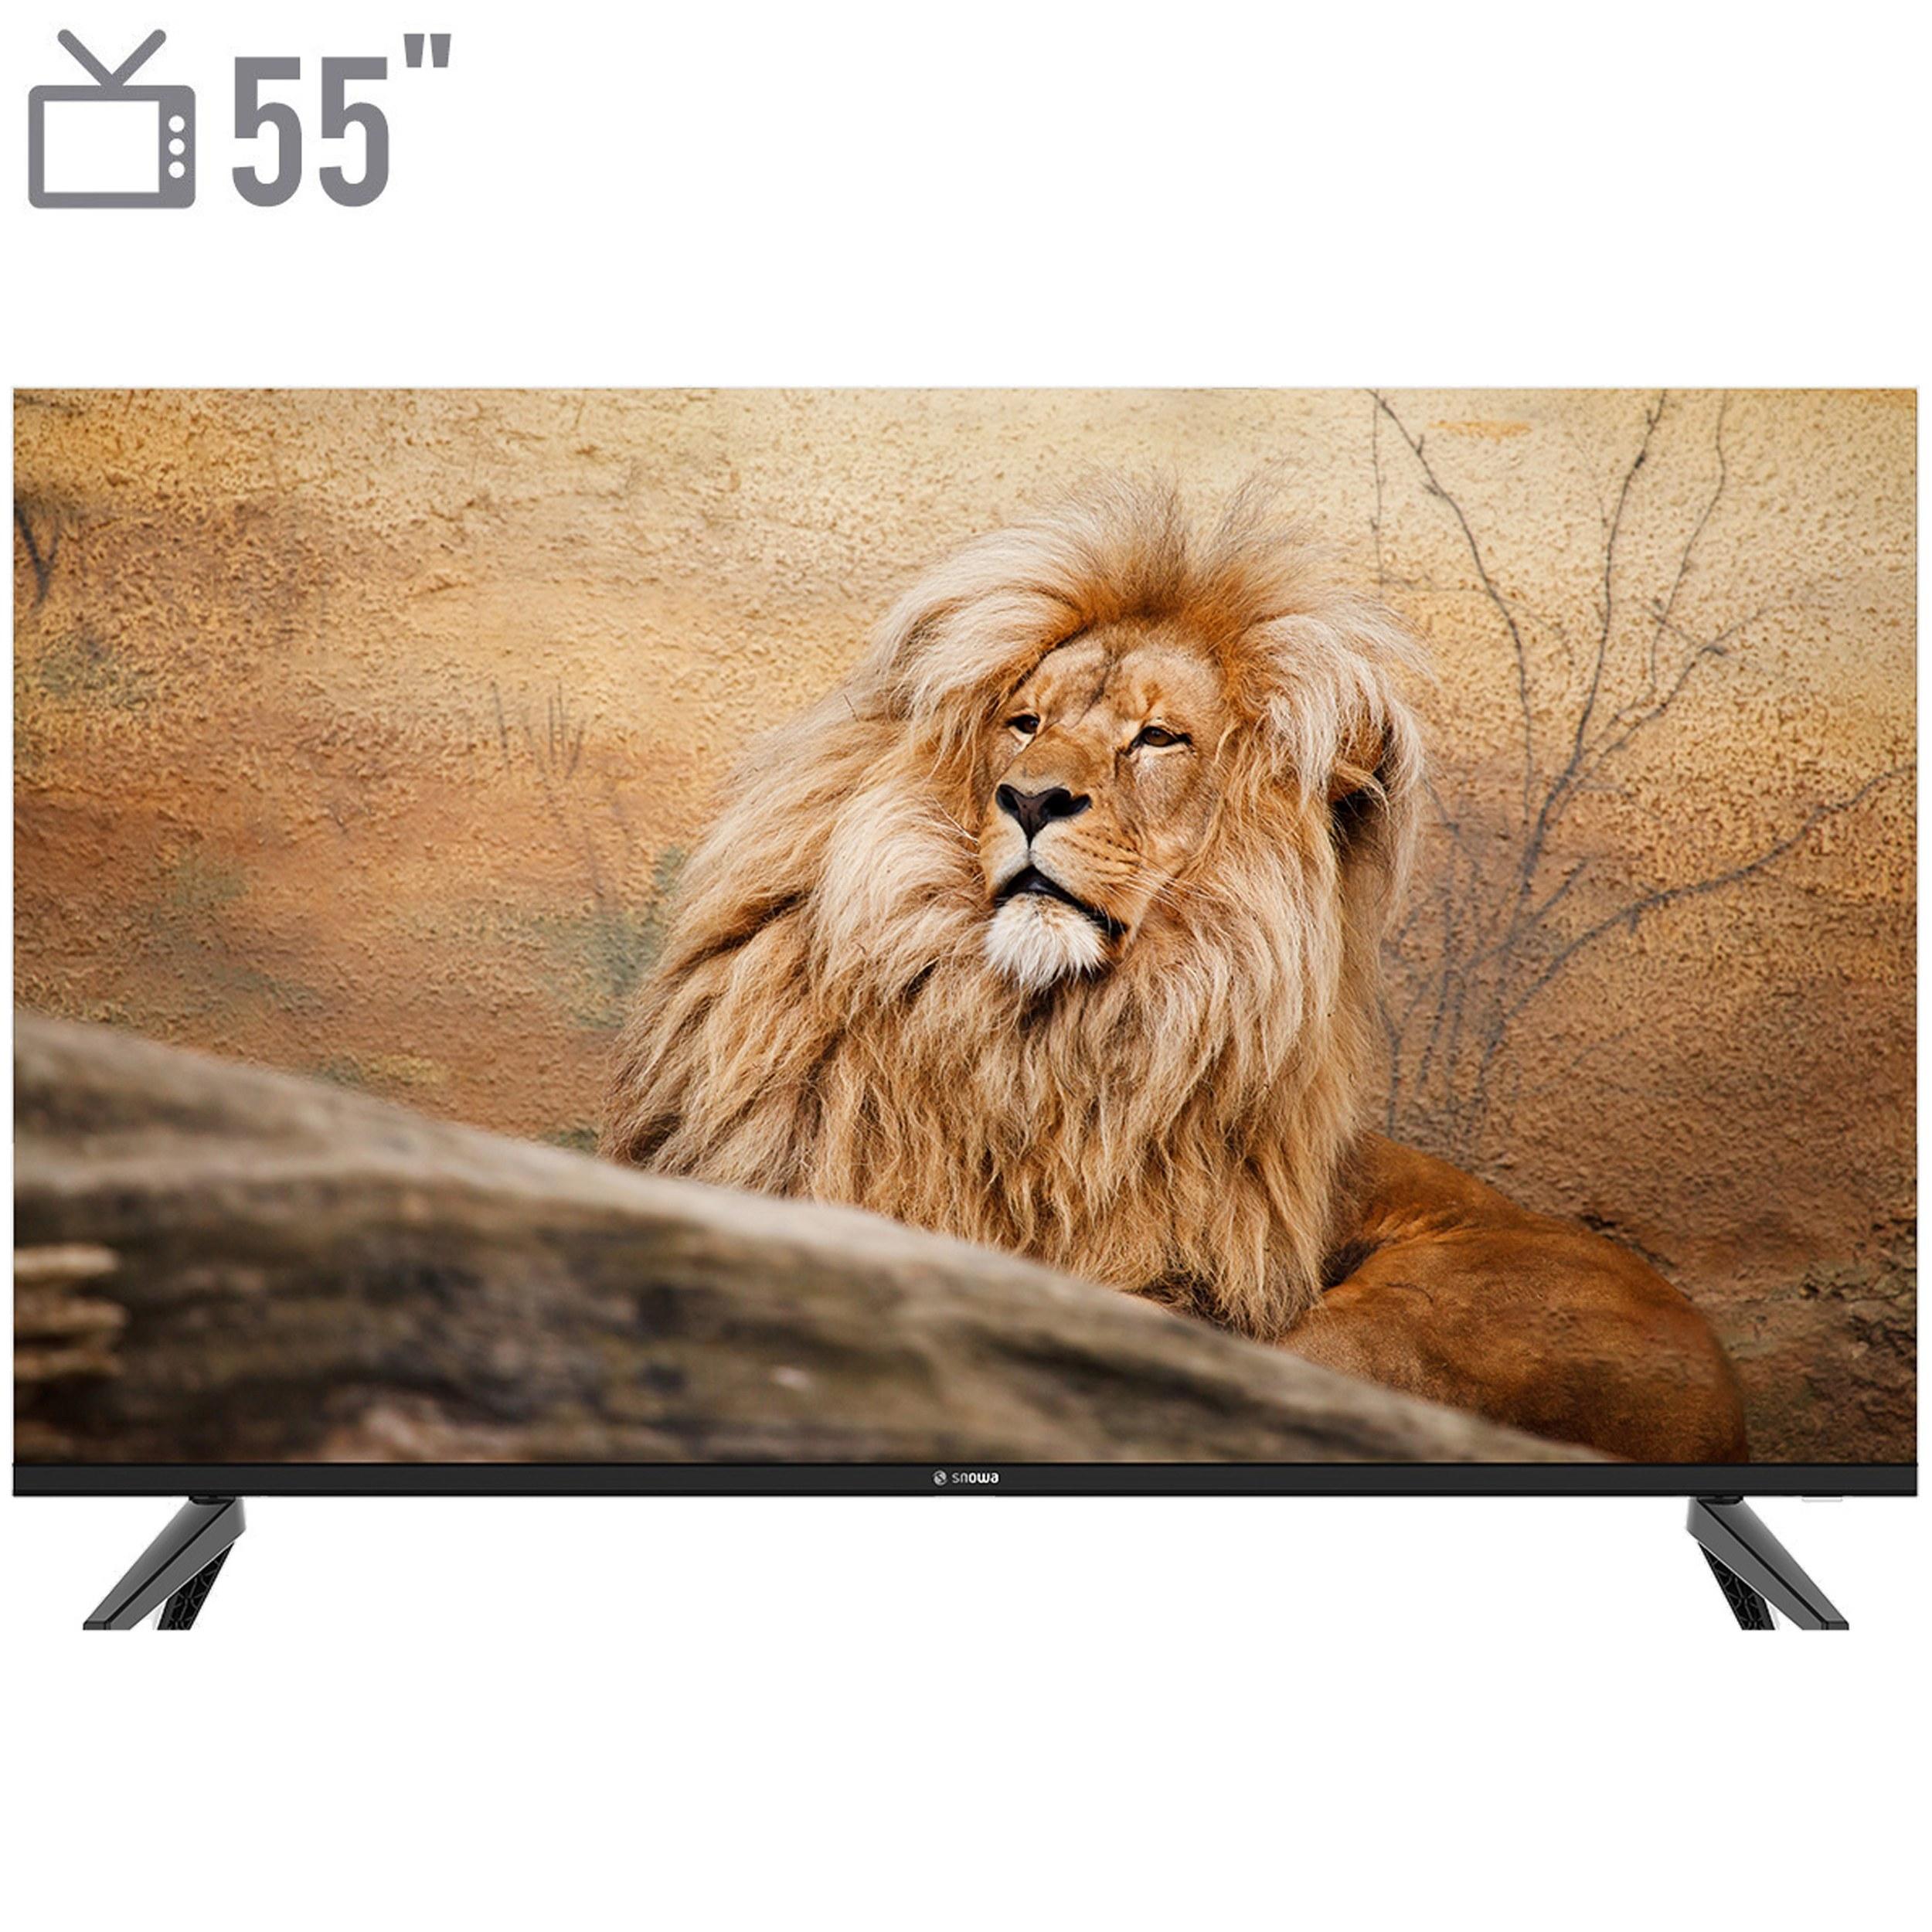 تصویر تلویزیون ال ای دی اسنوا مدل SLD-55SA260U سایز 55 اینچ Snowa SLD-55SA260U LED TV 55 Inch